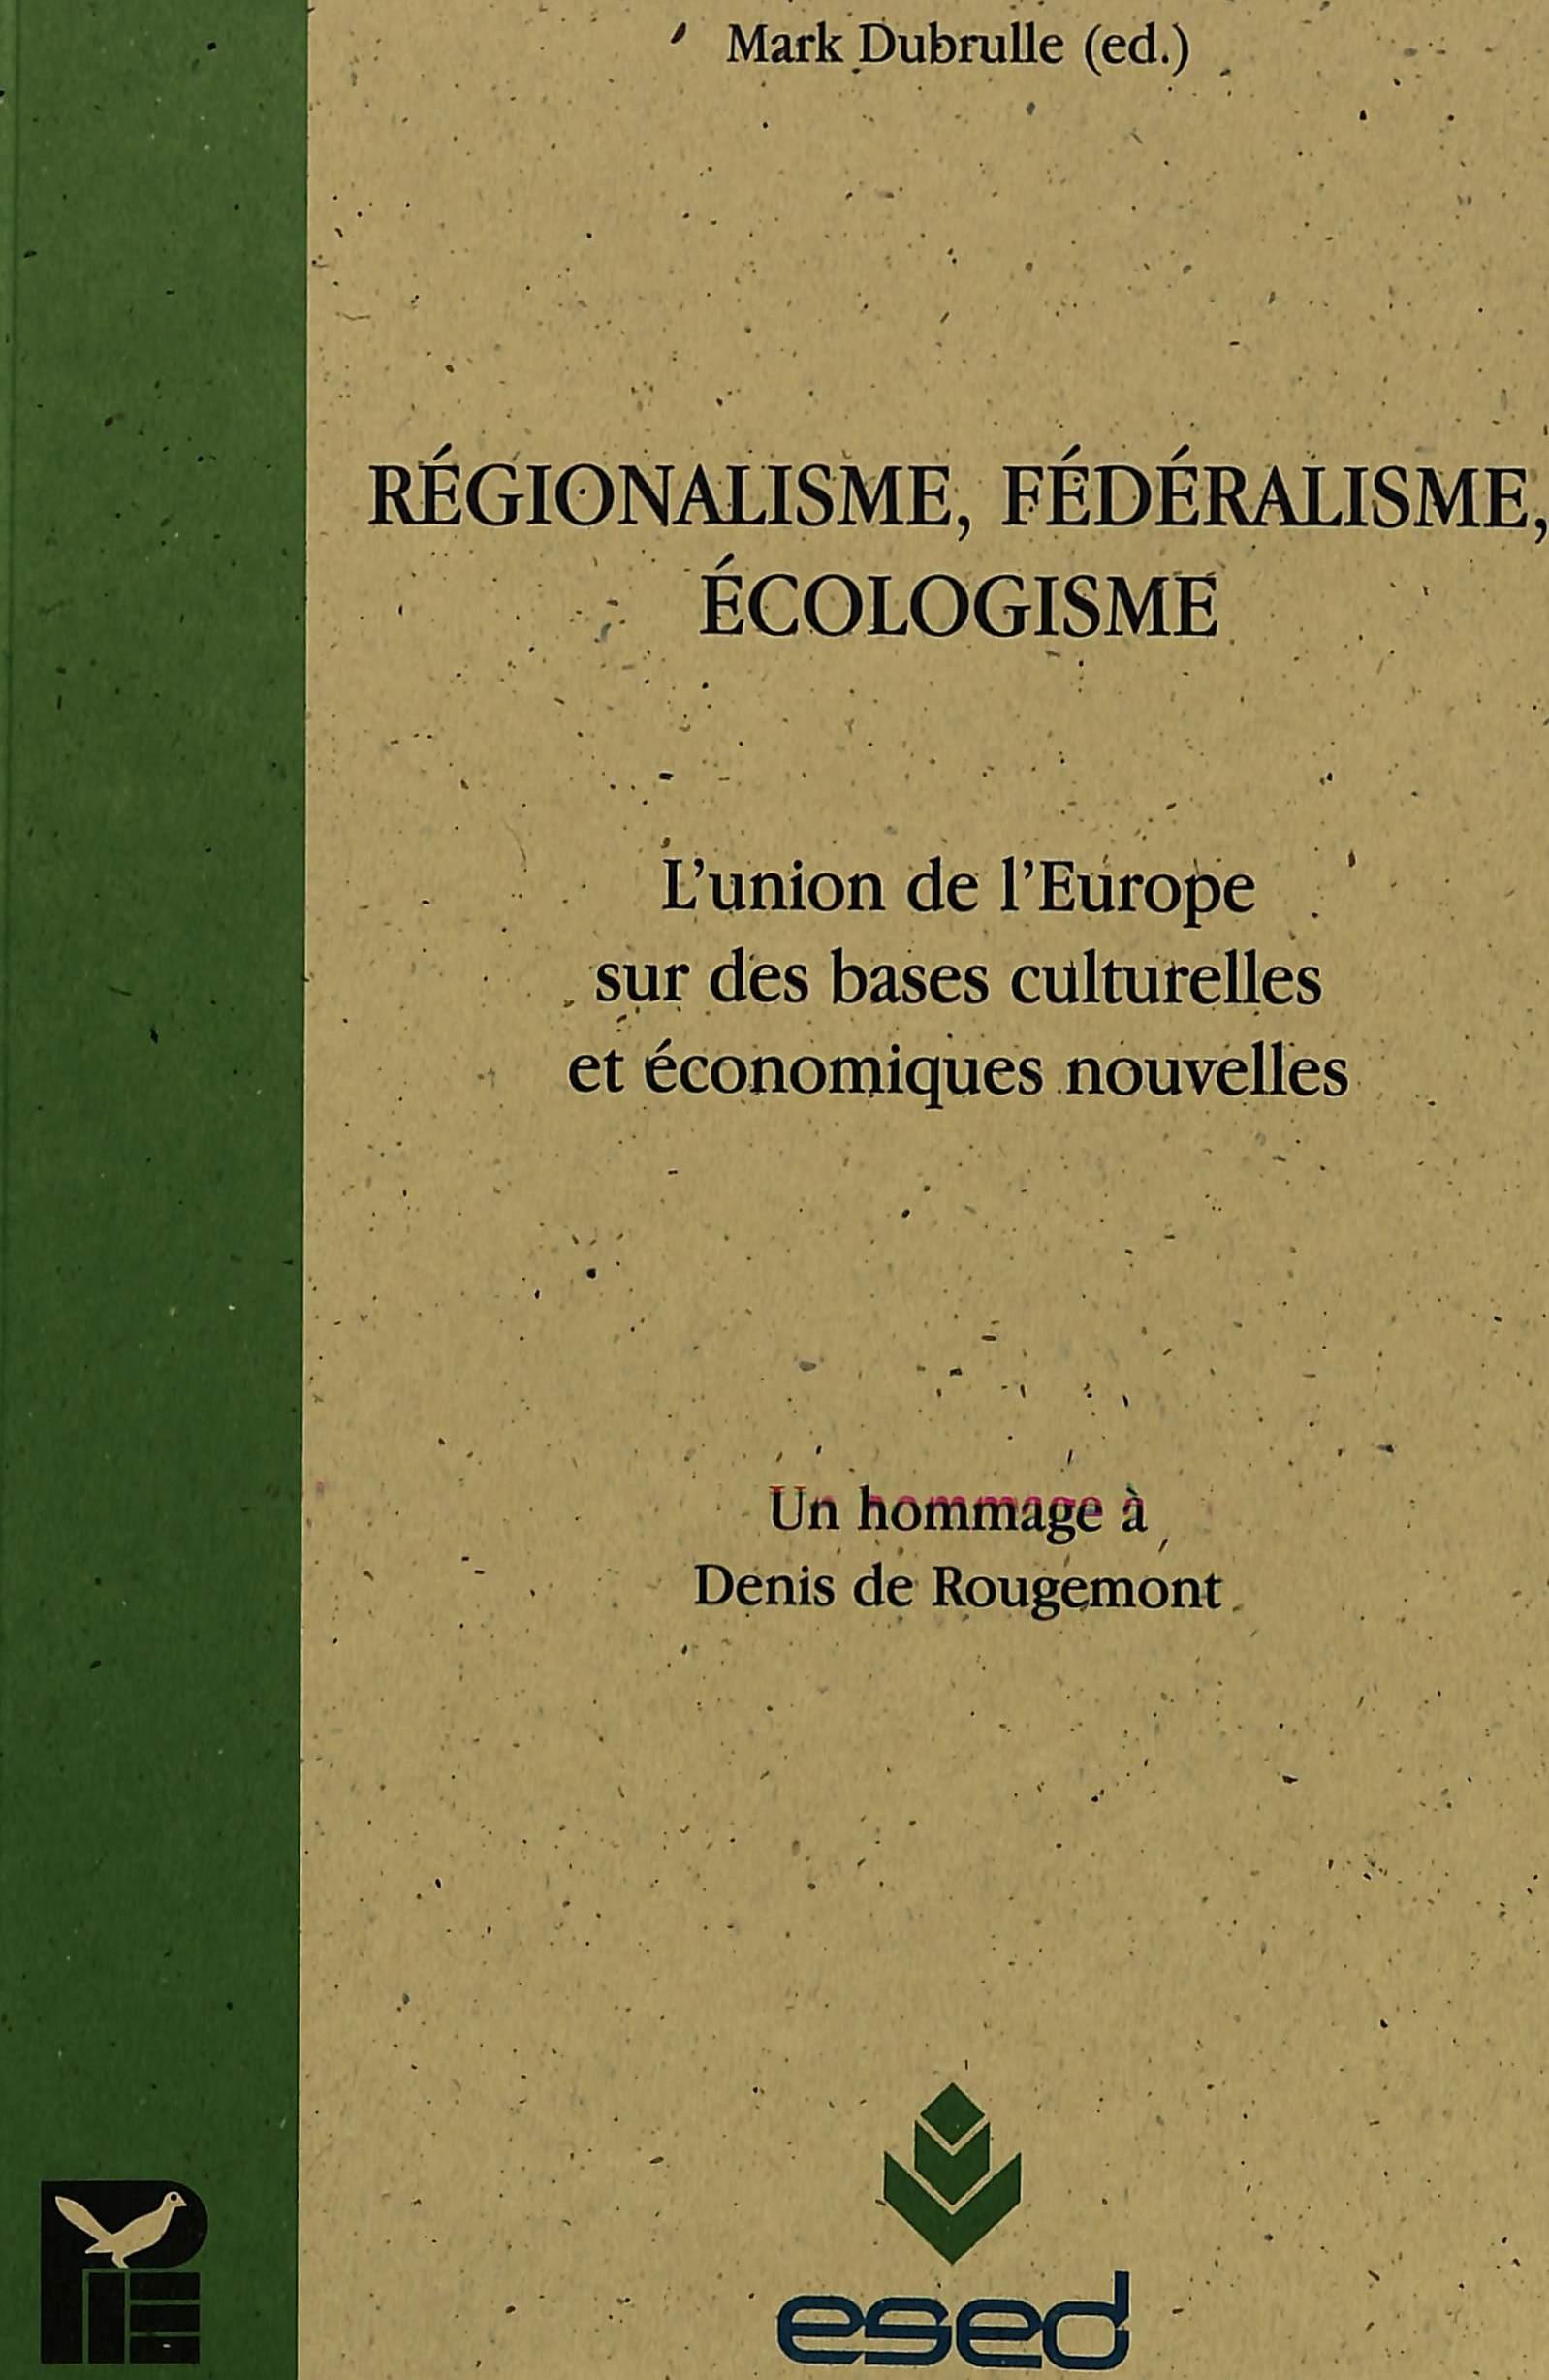 REGIONALISME, FEDERALISME, ECOLOGISME